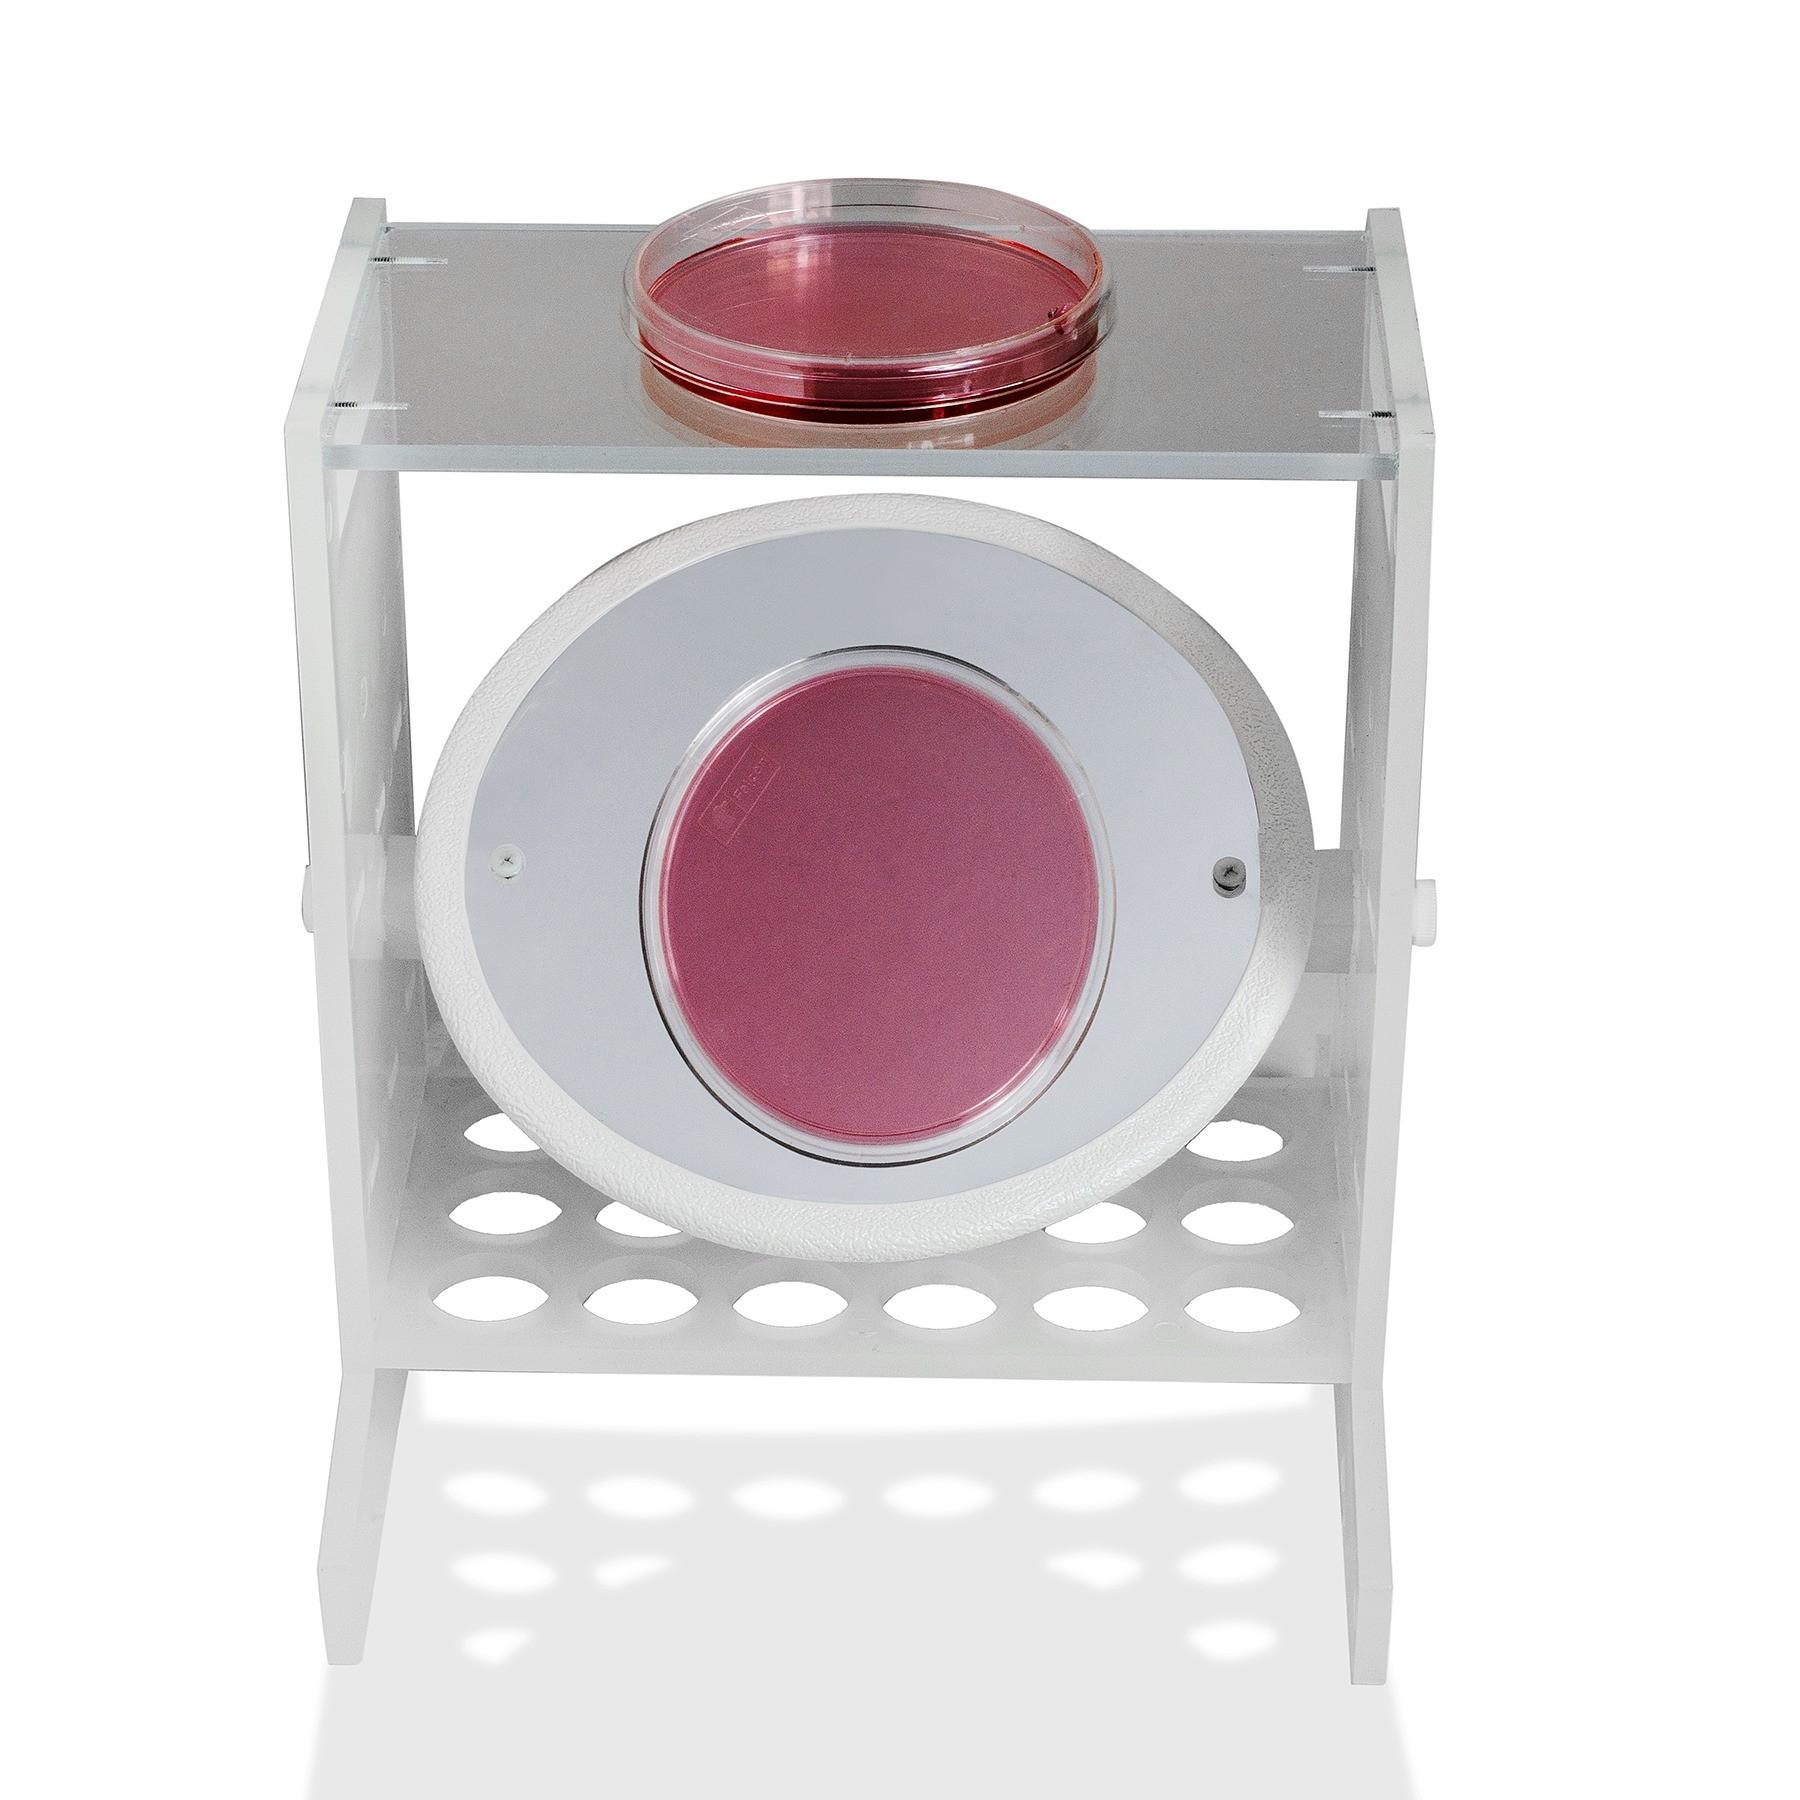 Contact Plate and Petri Dish Reader